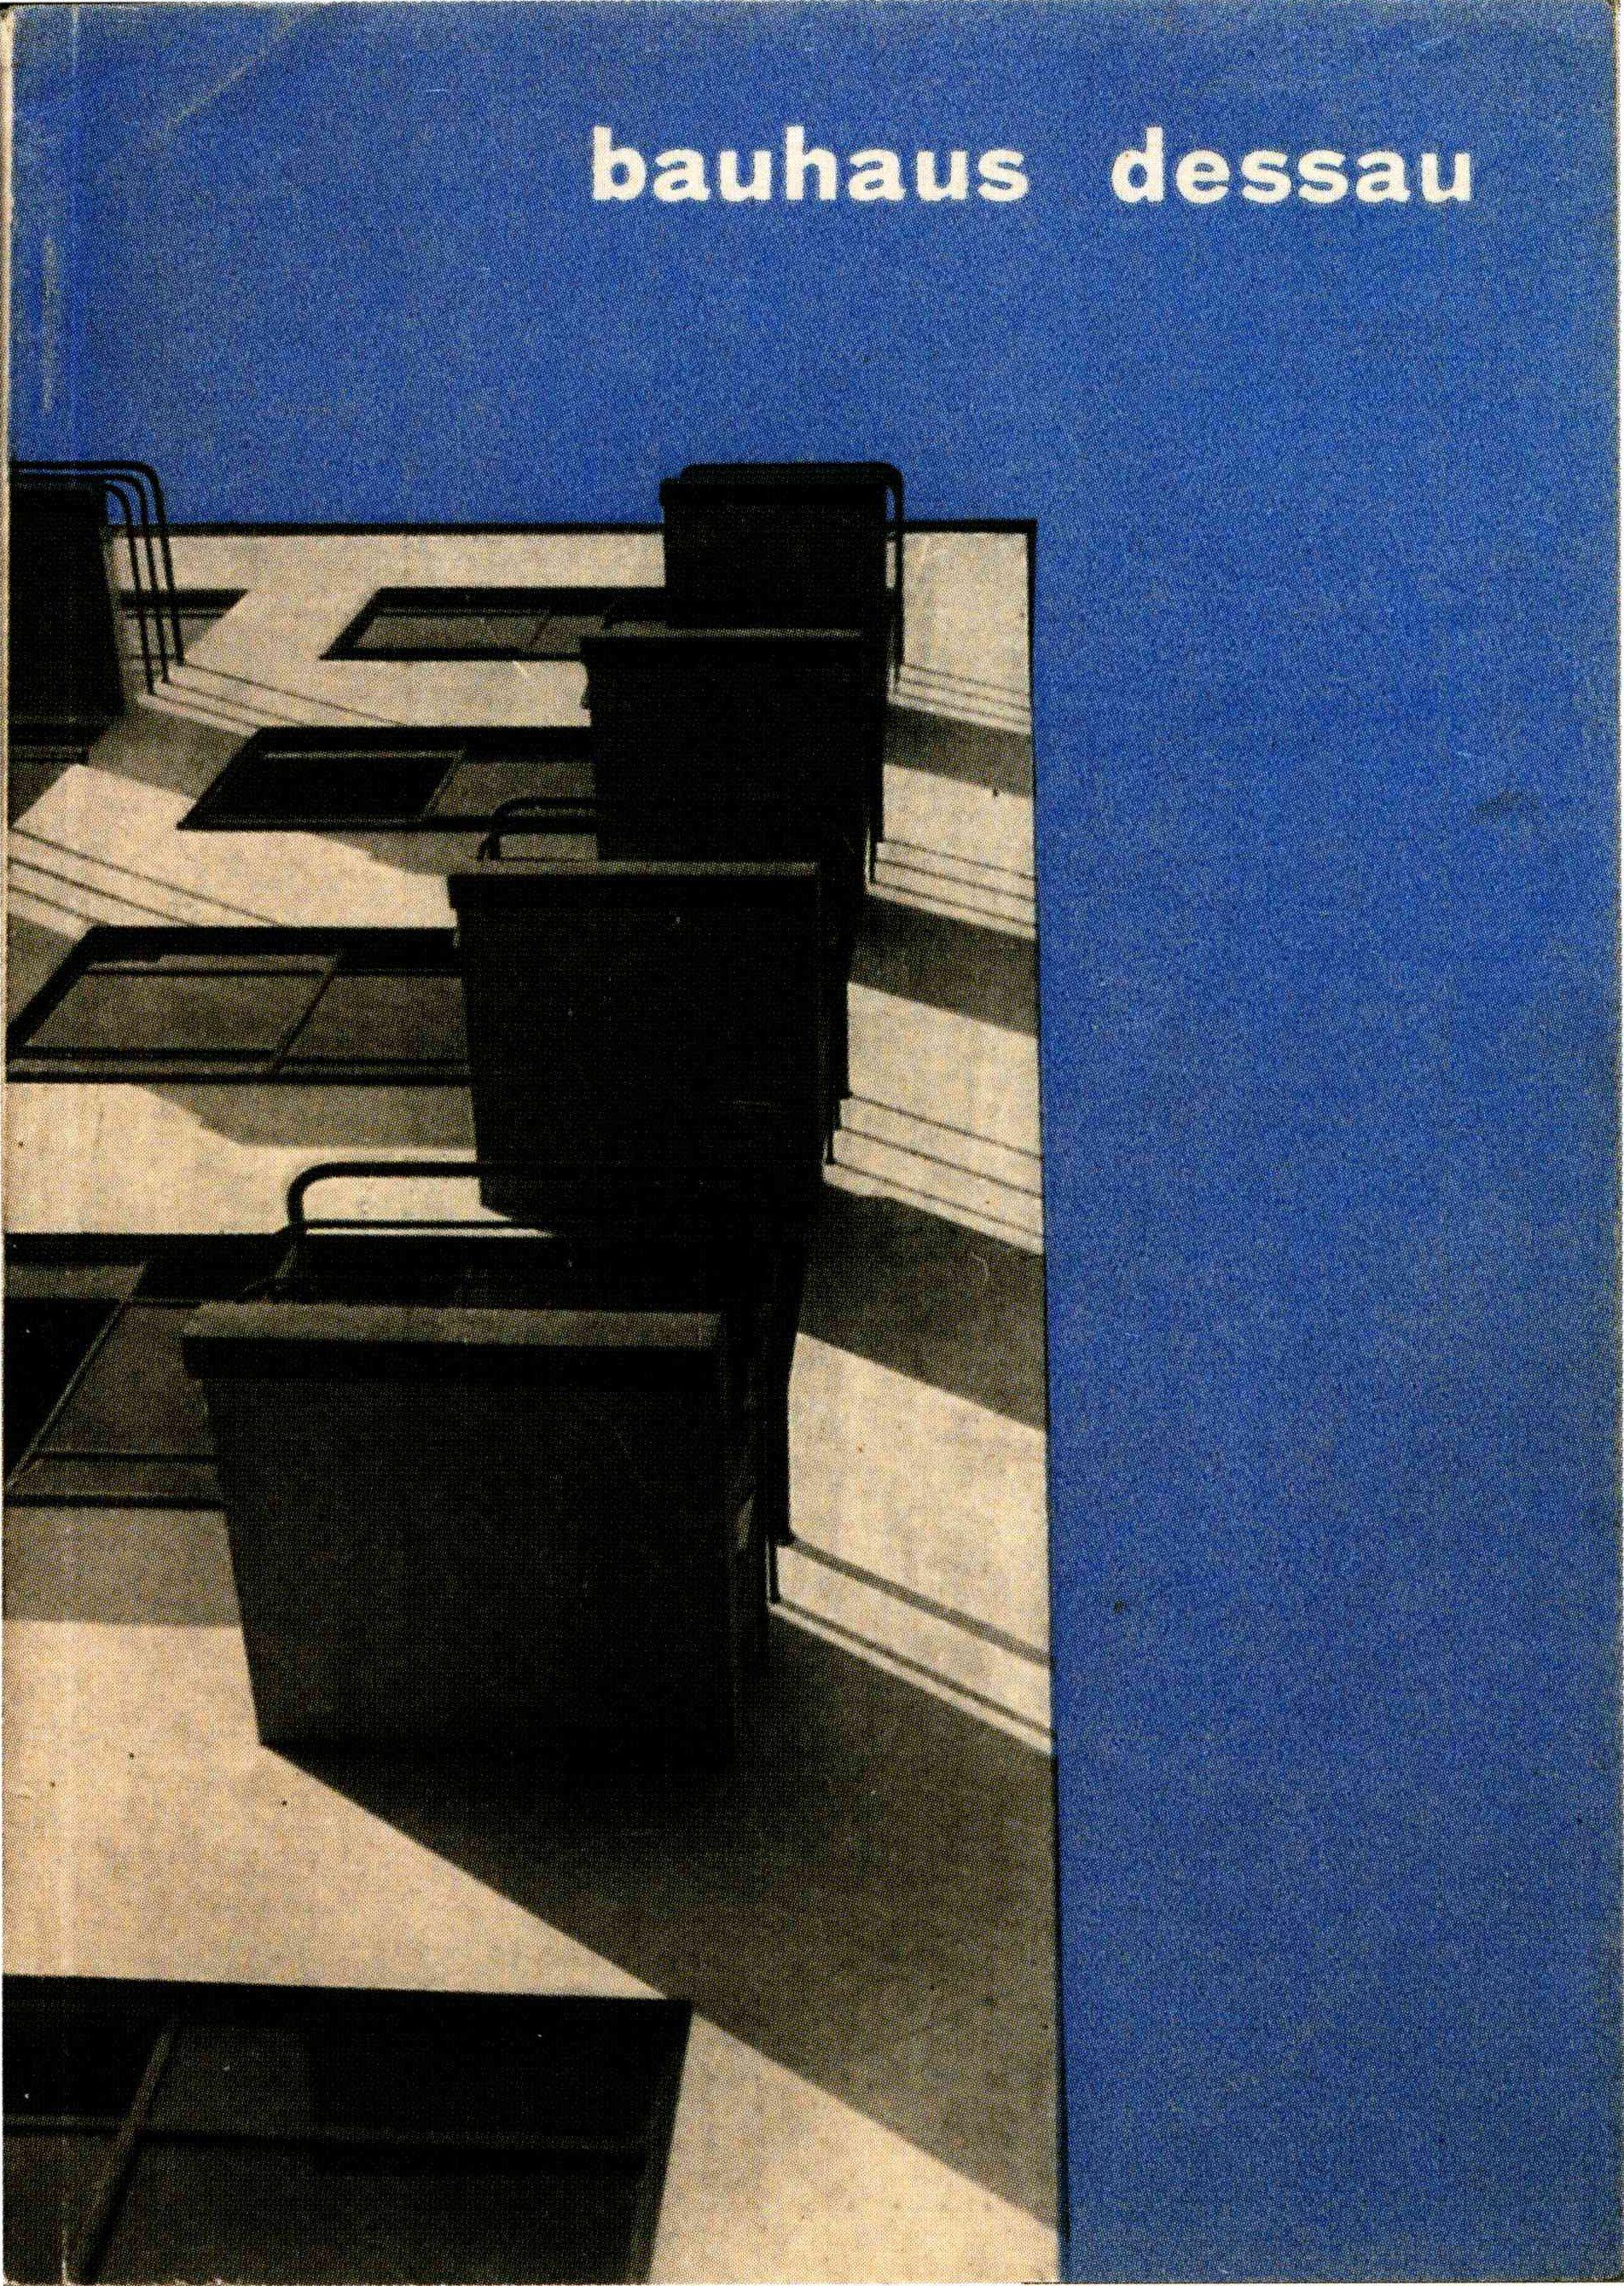 herbert bayer cover of bauhaus dessau college of design prospectus dessau bauhaus 1927. Black Bedroom Furniture Sets. Home Design Ideas